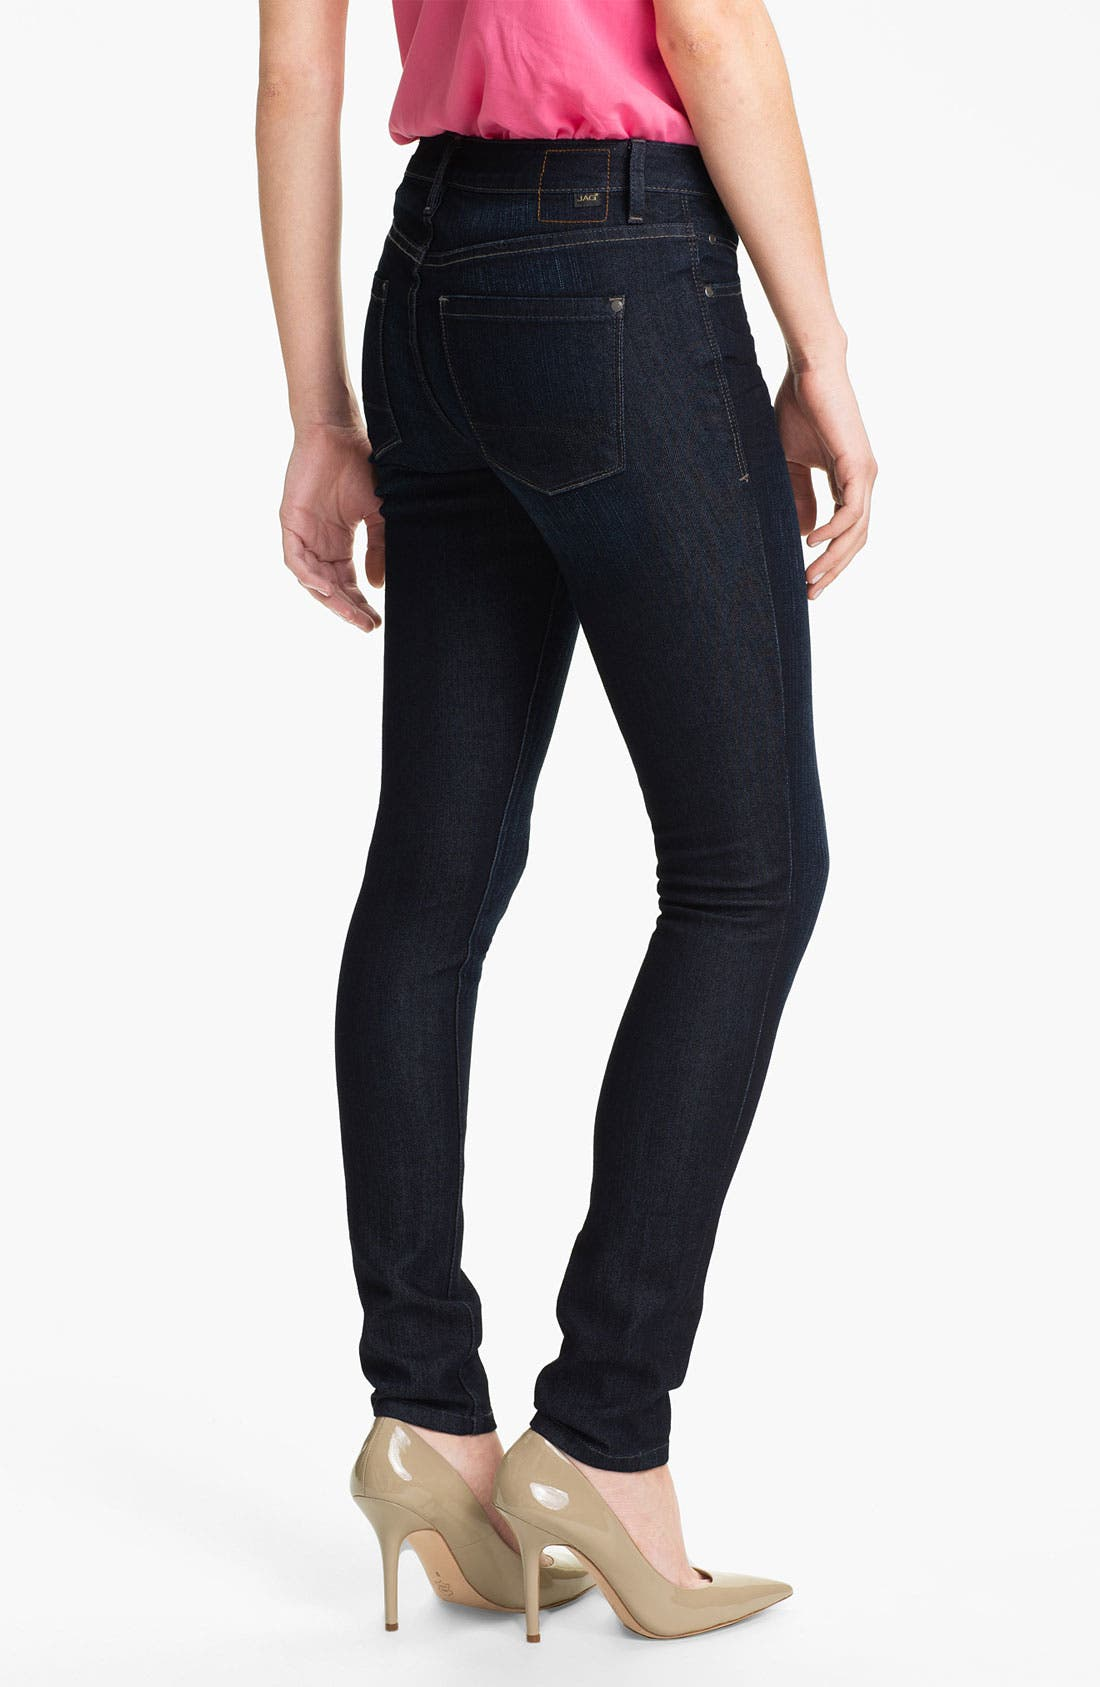 Alternate Image 2  - Jag Jeans 'Reece' Skinny Jeans (Petite)